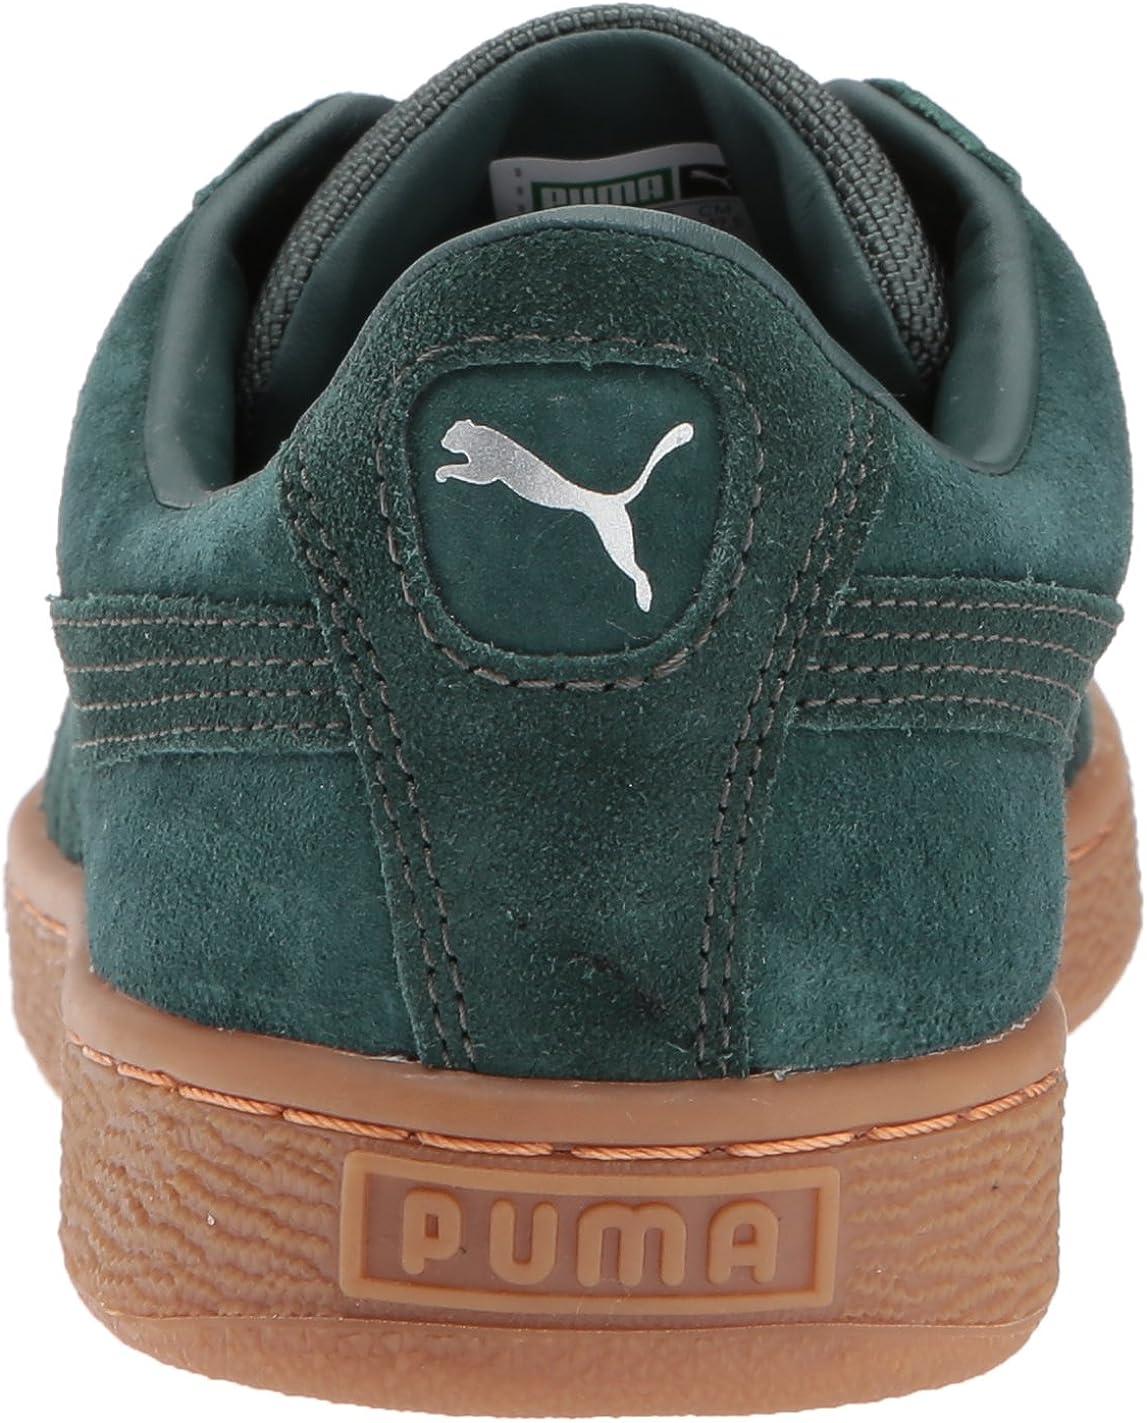 puma basket classic weatherproof trainers sunflower